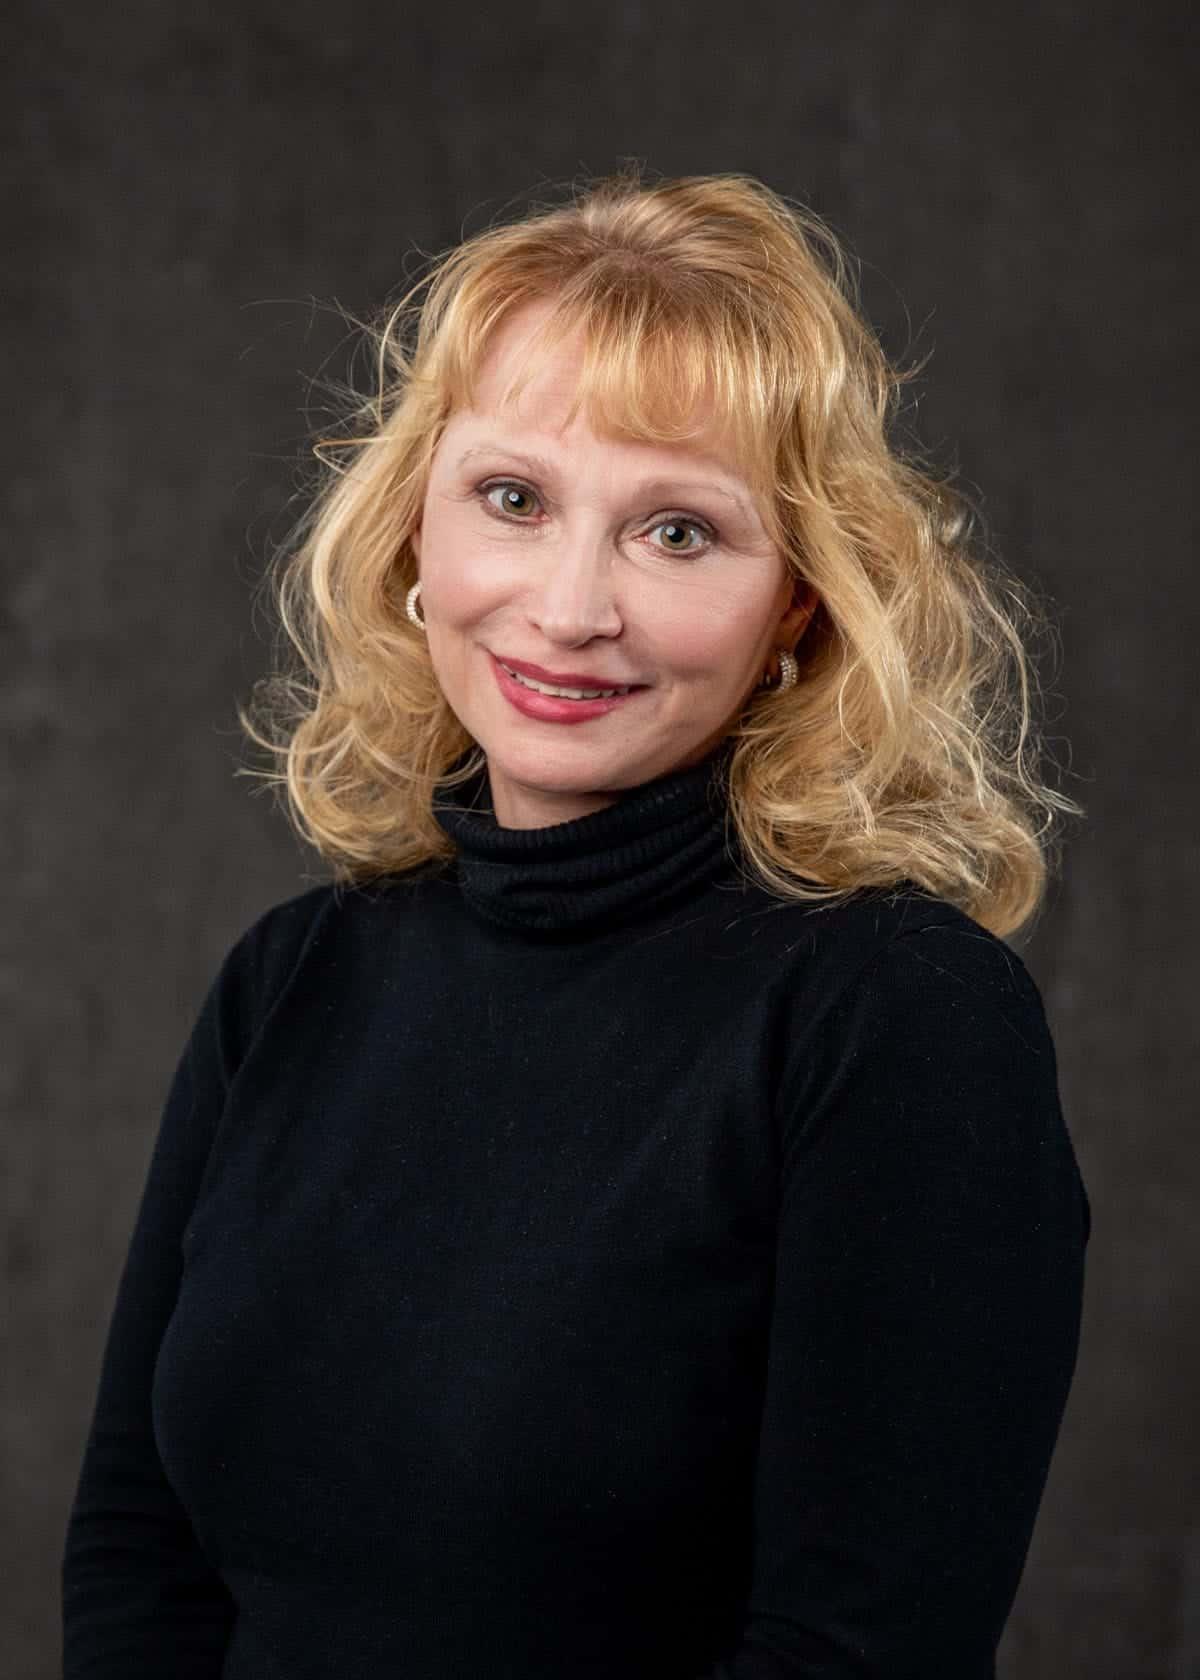 Dr. Deborah Bradford, Vice President of Outpatient Services